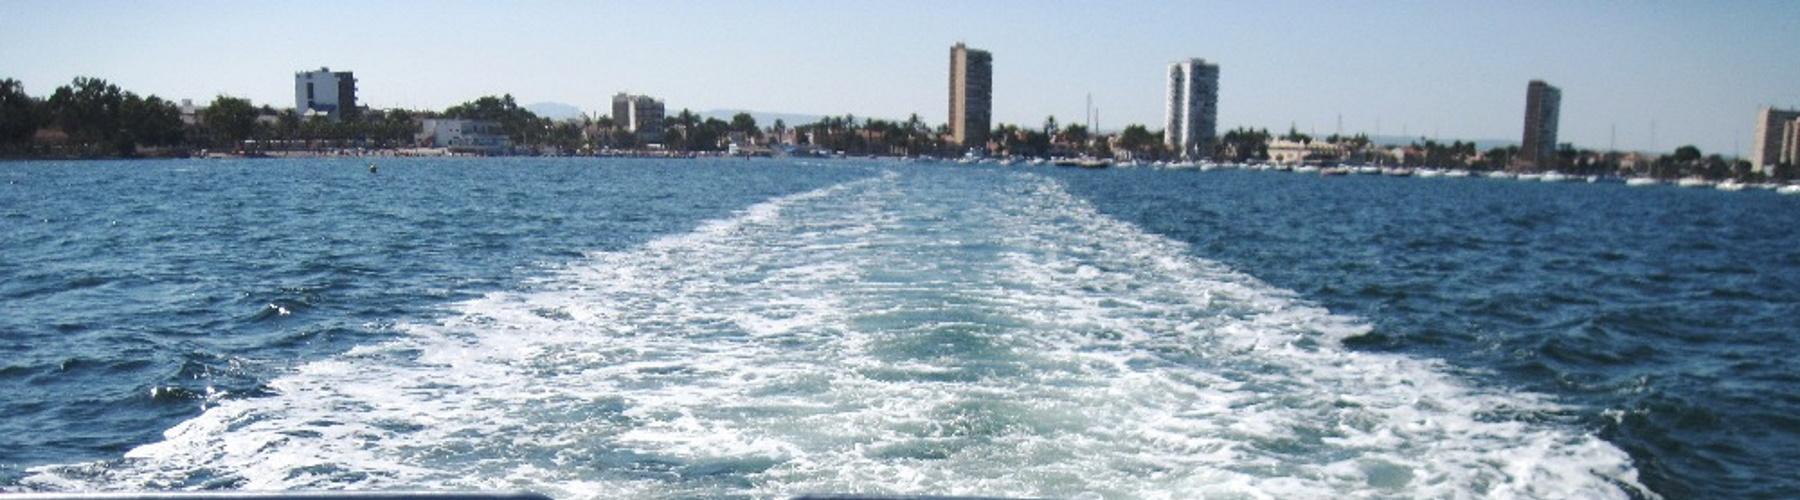 EuroTourGuide Coach Tour 07 Thursday 24th June Mar Menor and Boat Trip